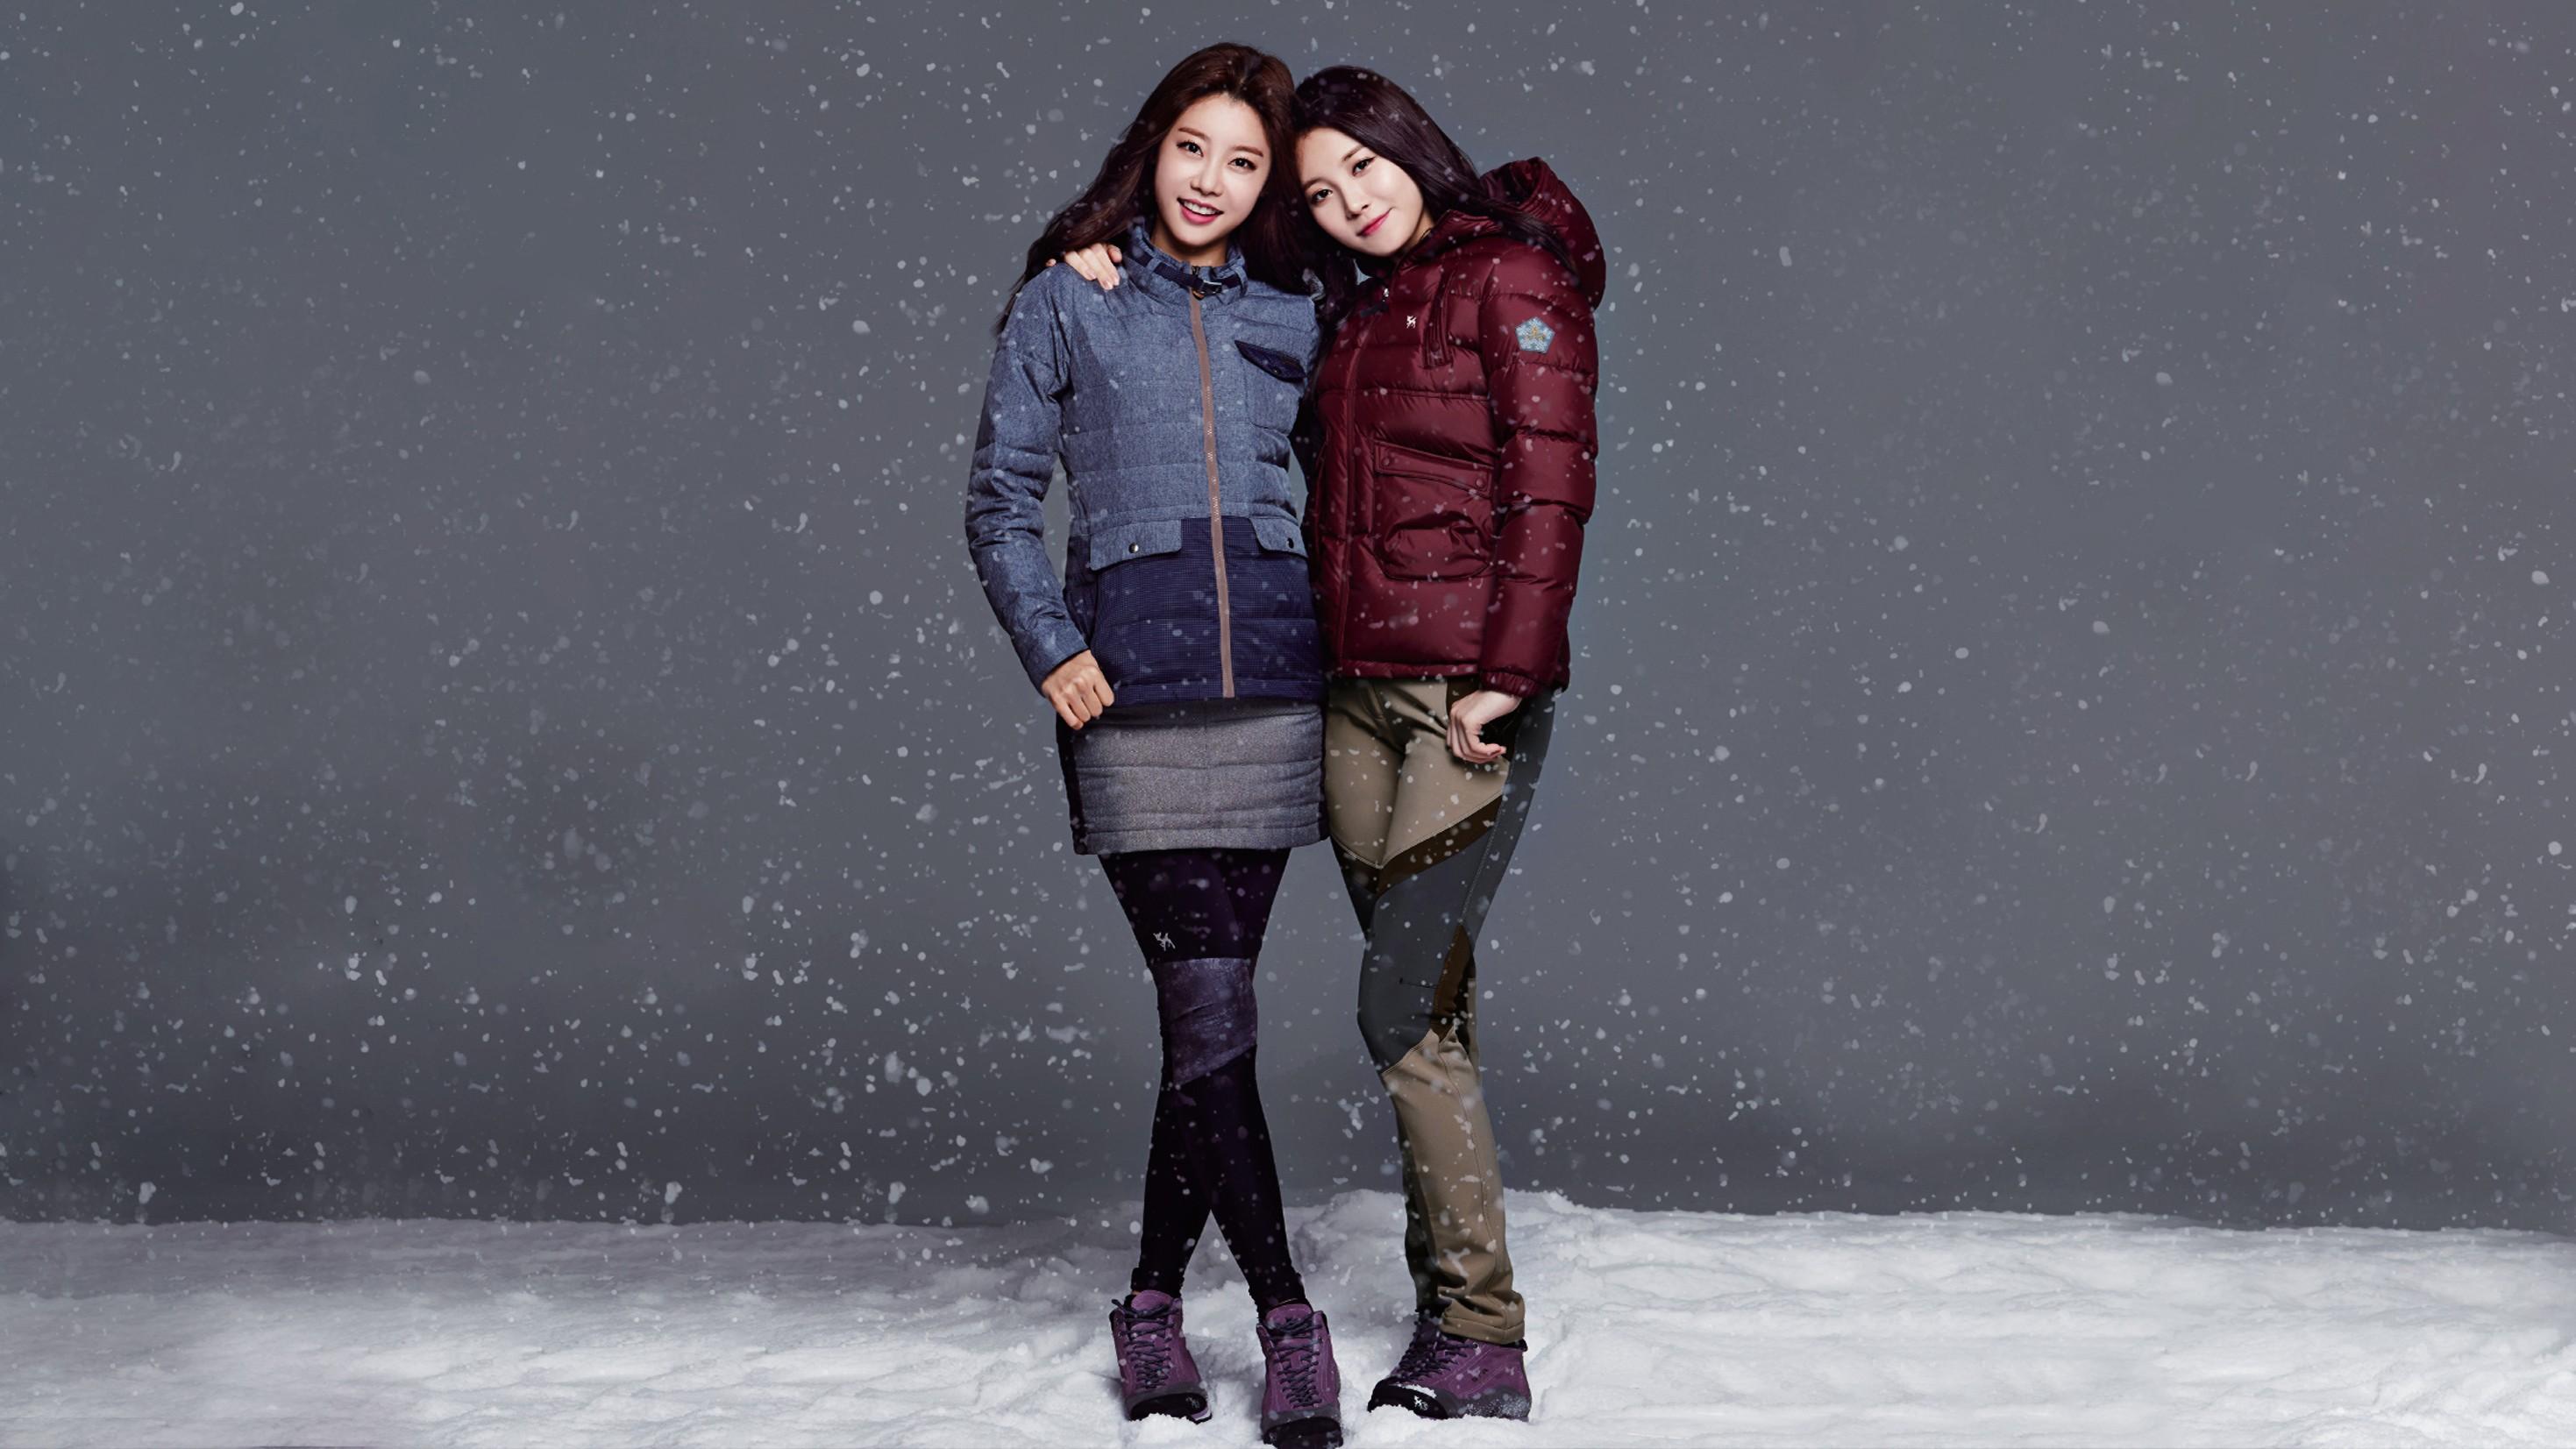 Wallpaper Women Asian Snow Winter Fashion Korean Spring Weather Season Footwear Photo Shoot 2938x1653 Rocketizada 198355 Hd Wallpapers Wallhere